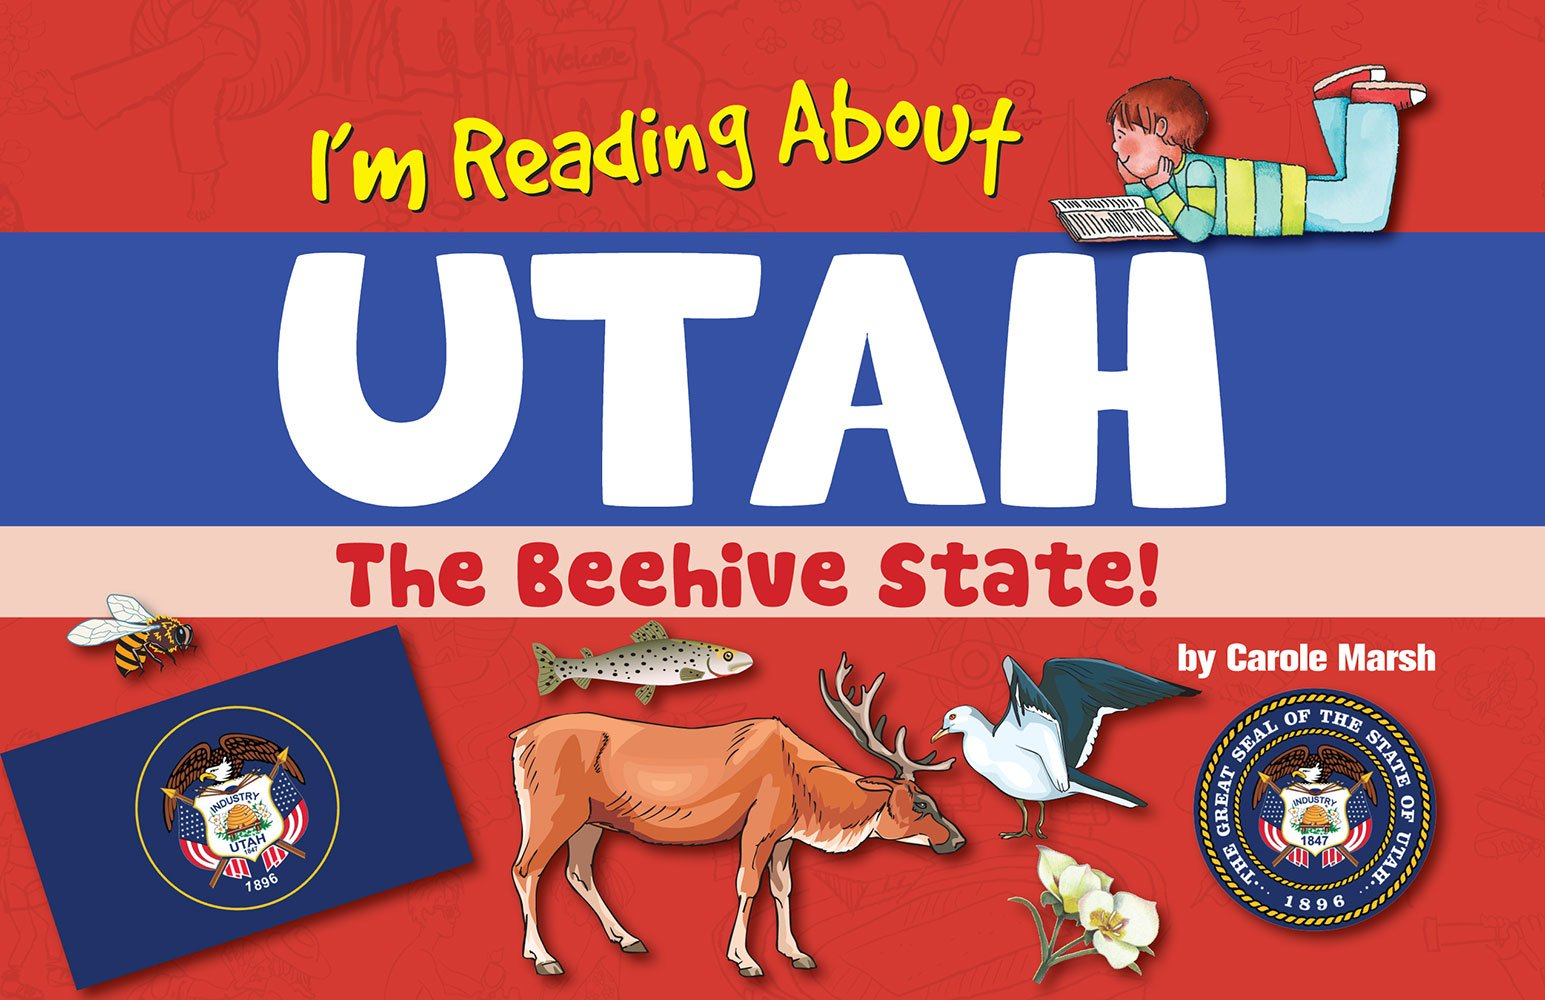 I'm Reading About Utah (Utah Experience)